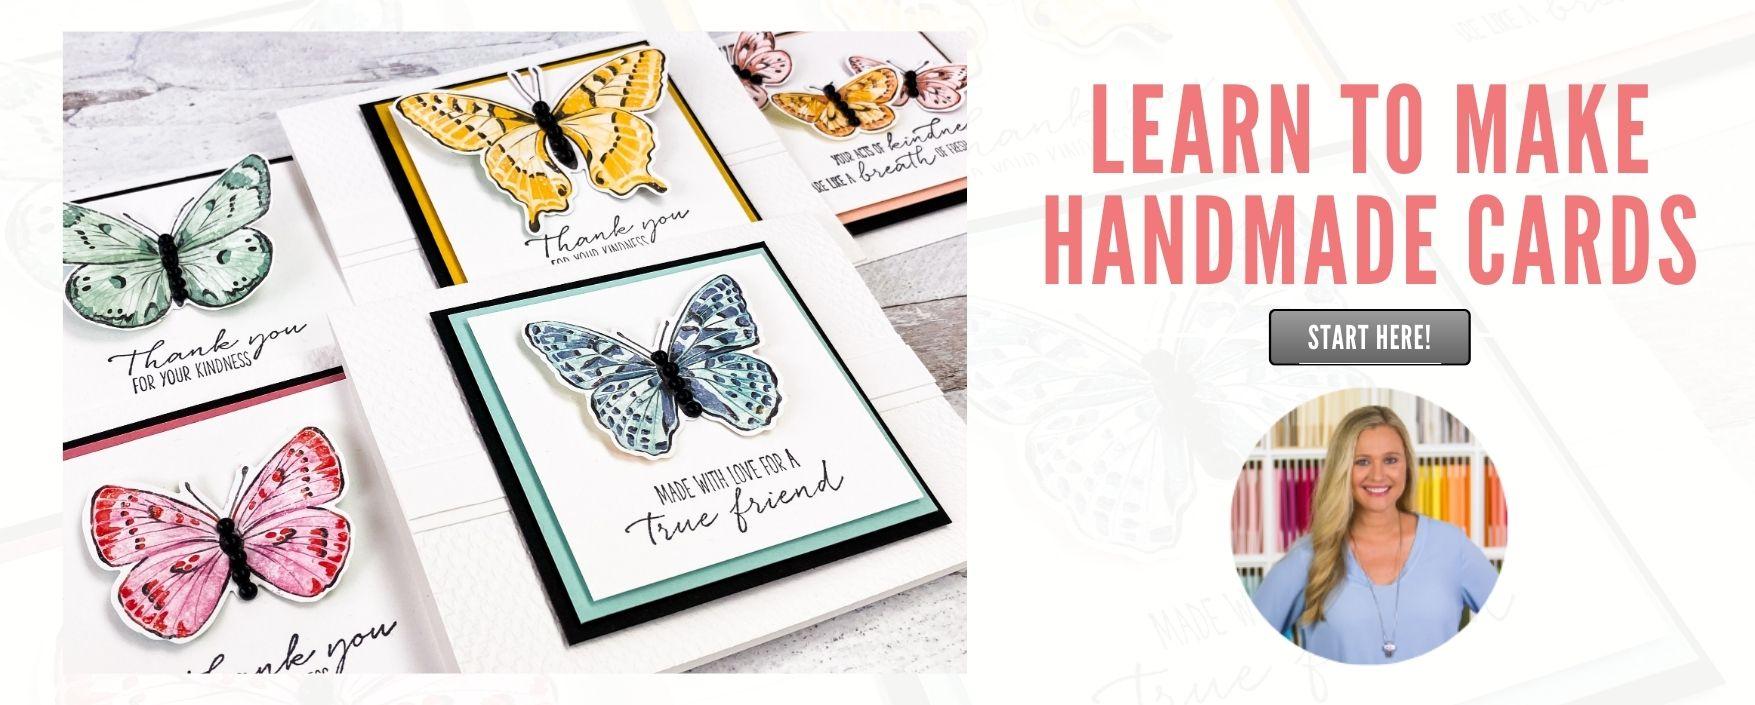 Learn to Make Handmade Cards